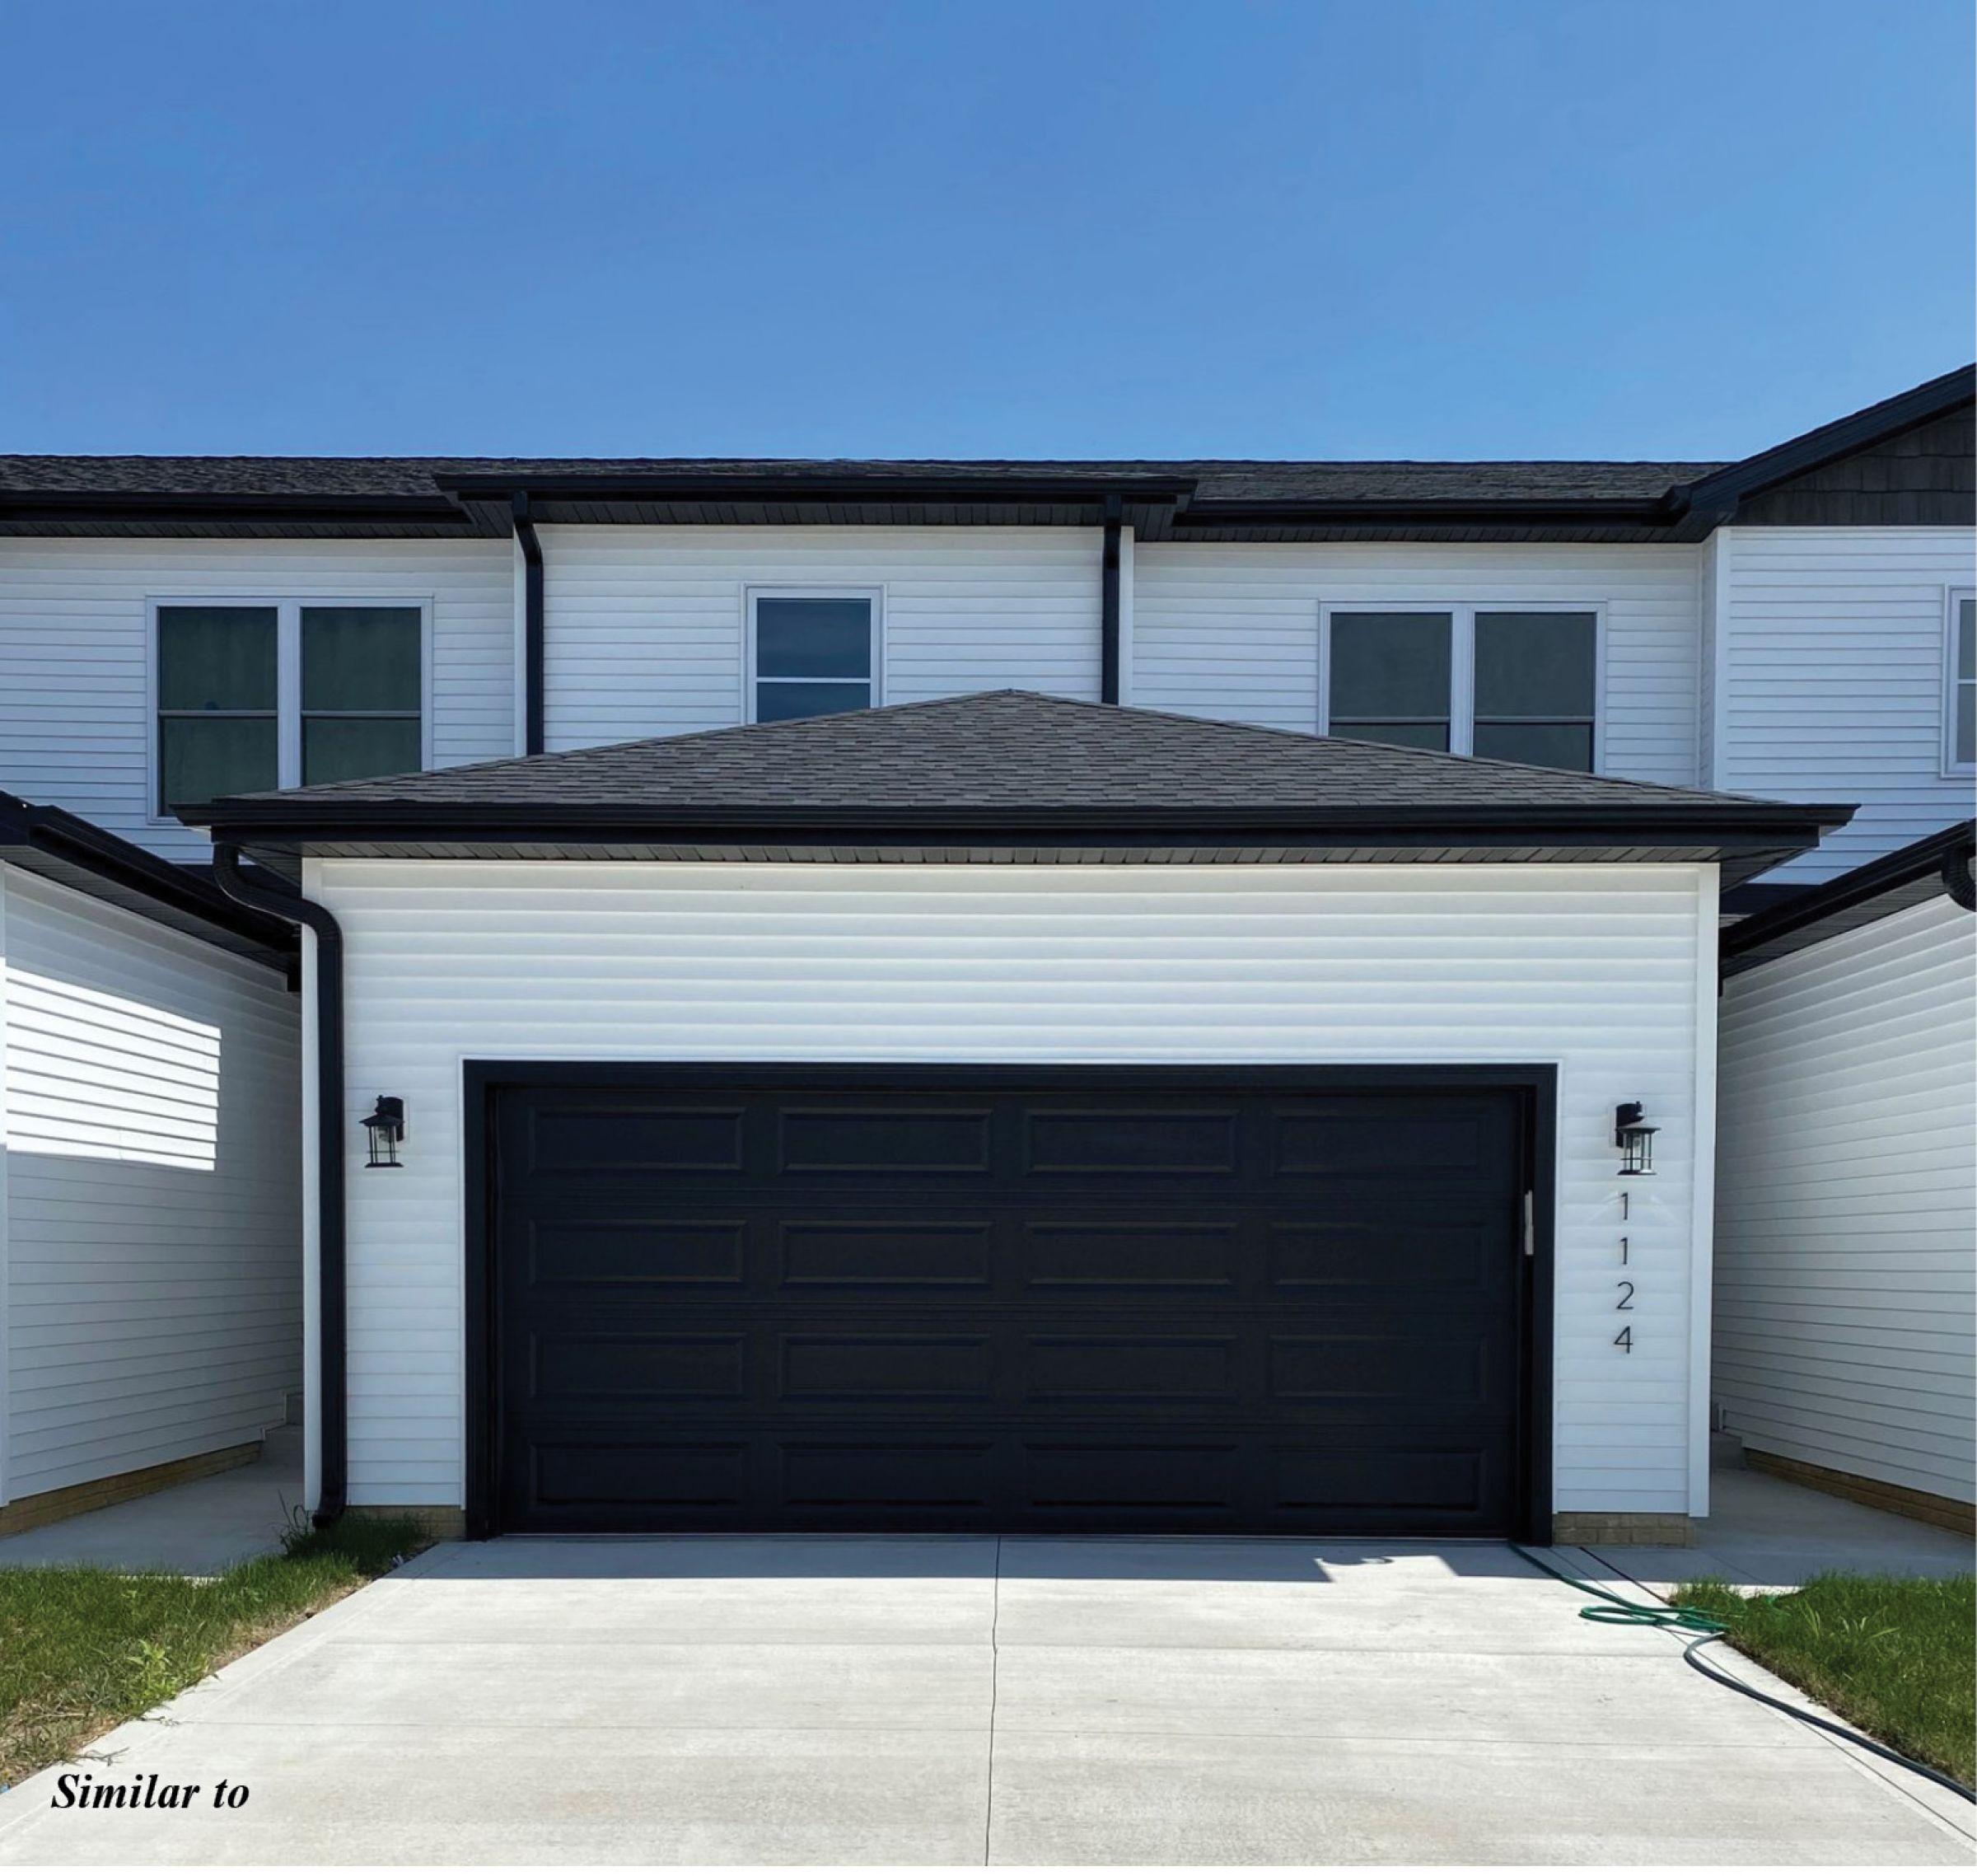 residential-warren-county-iowa-0-acres-listing-number-15675-0-2021-08-06-142140.jpg